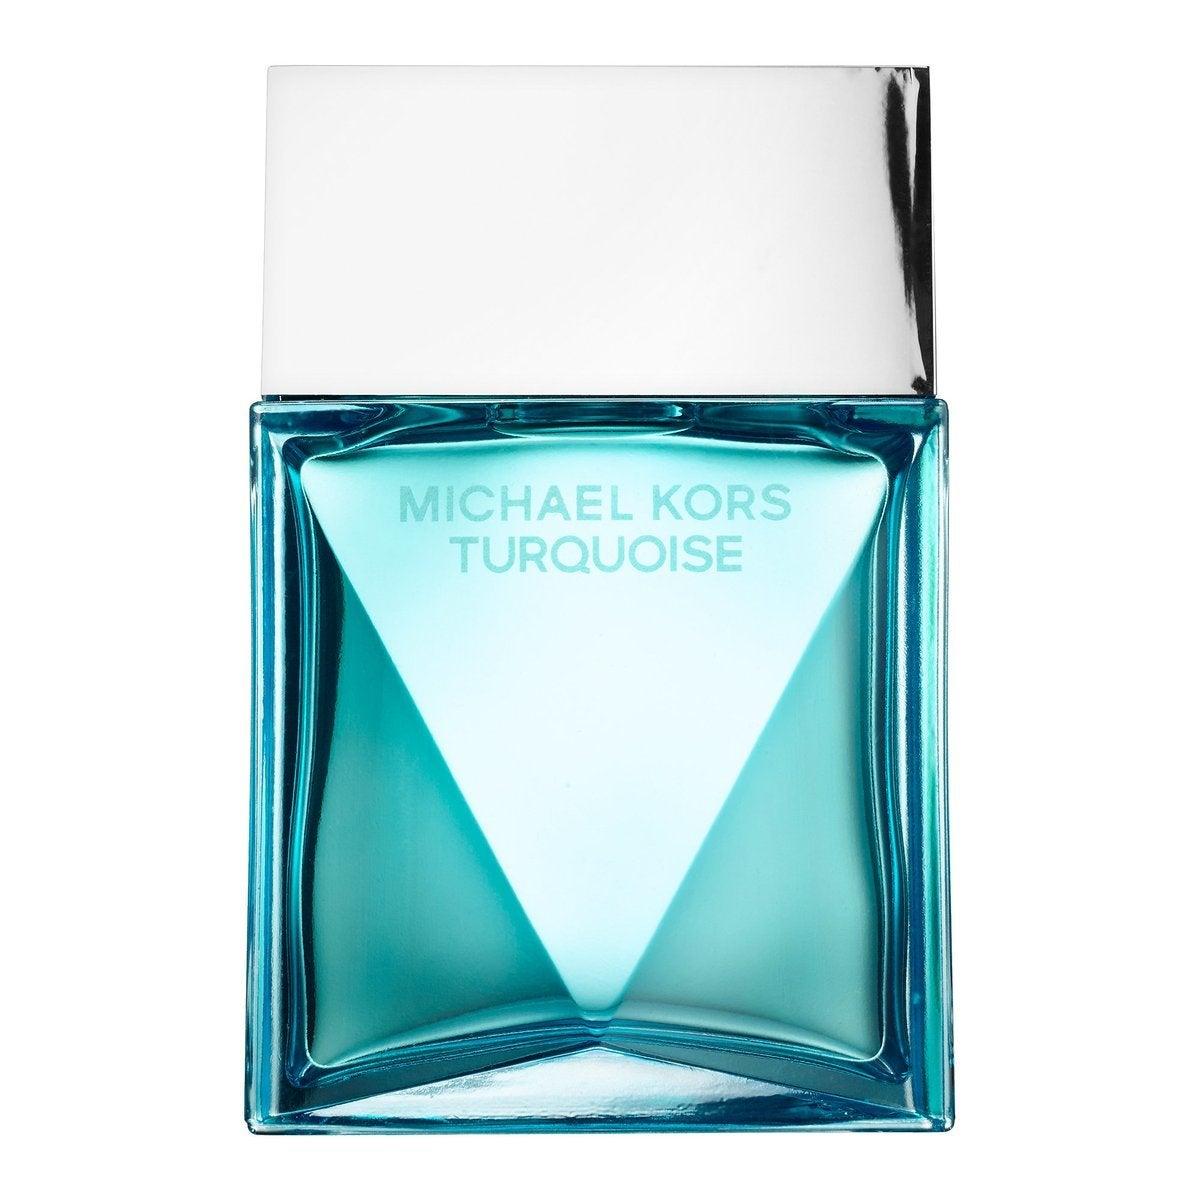 Michael Kors Michael Kors Turquoise 50ml EDP Women's Perfume